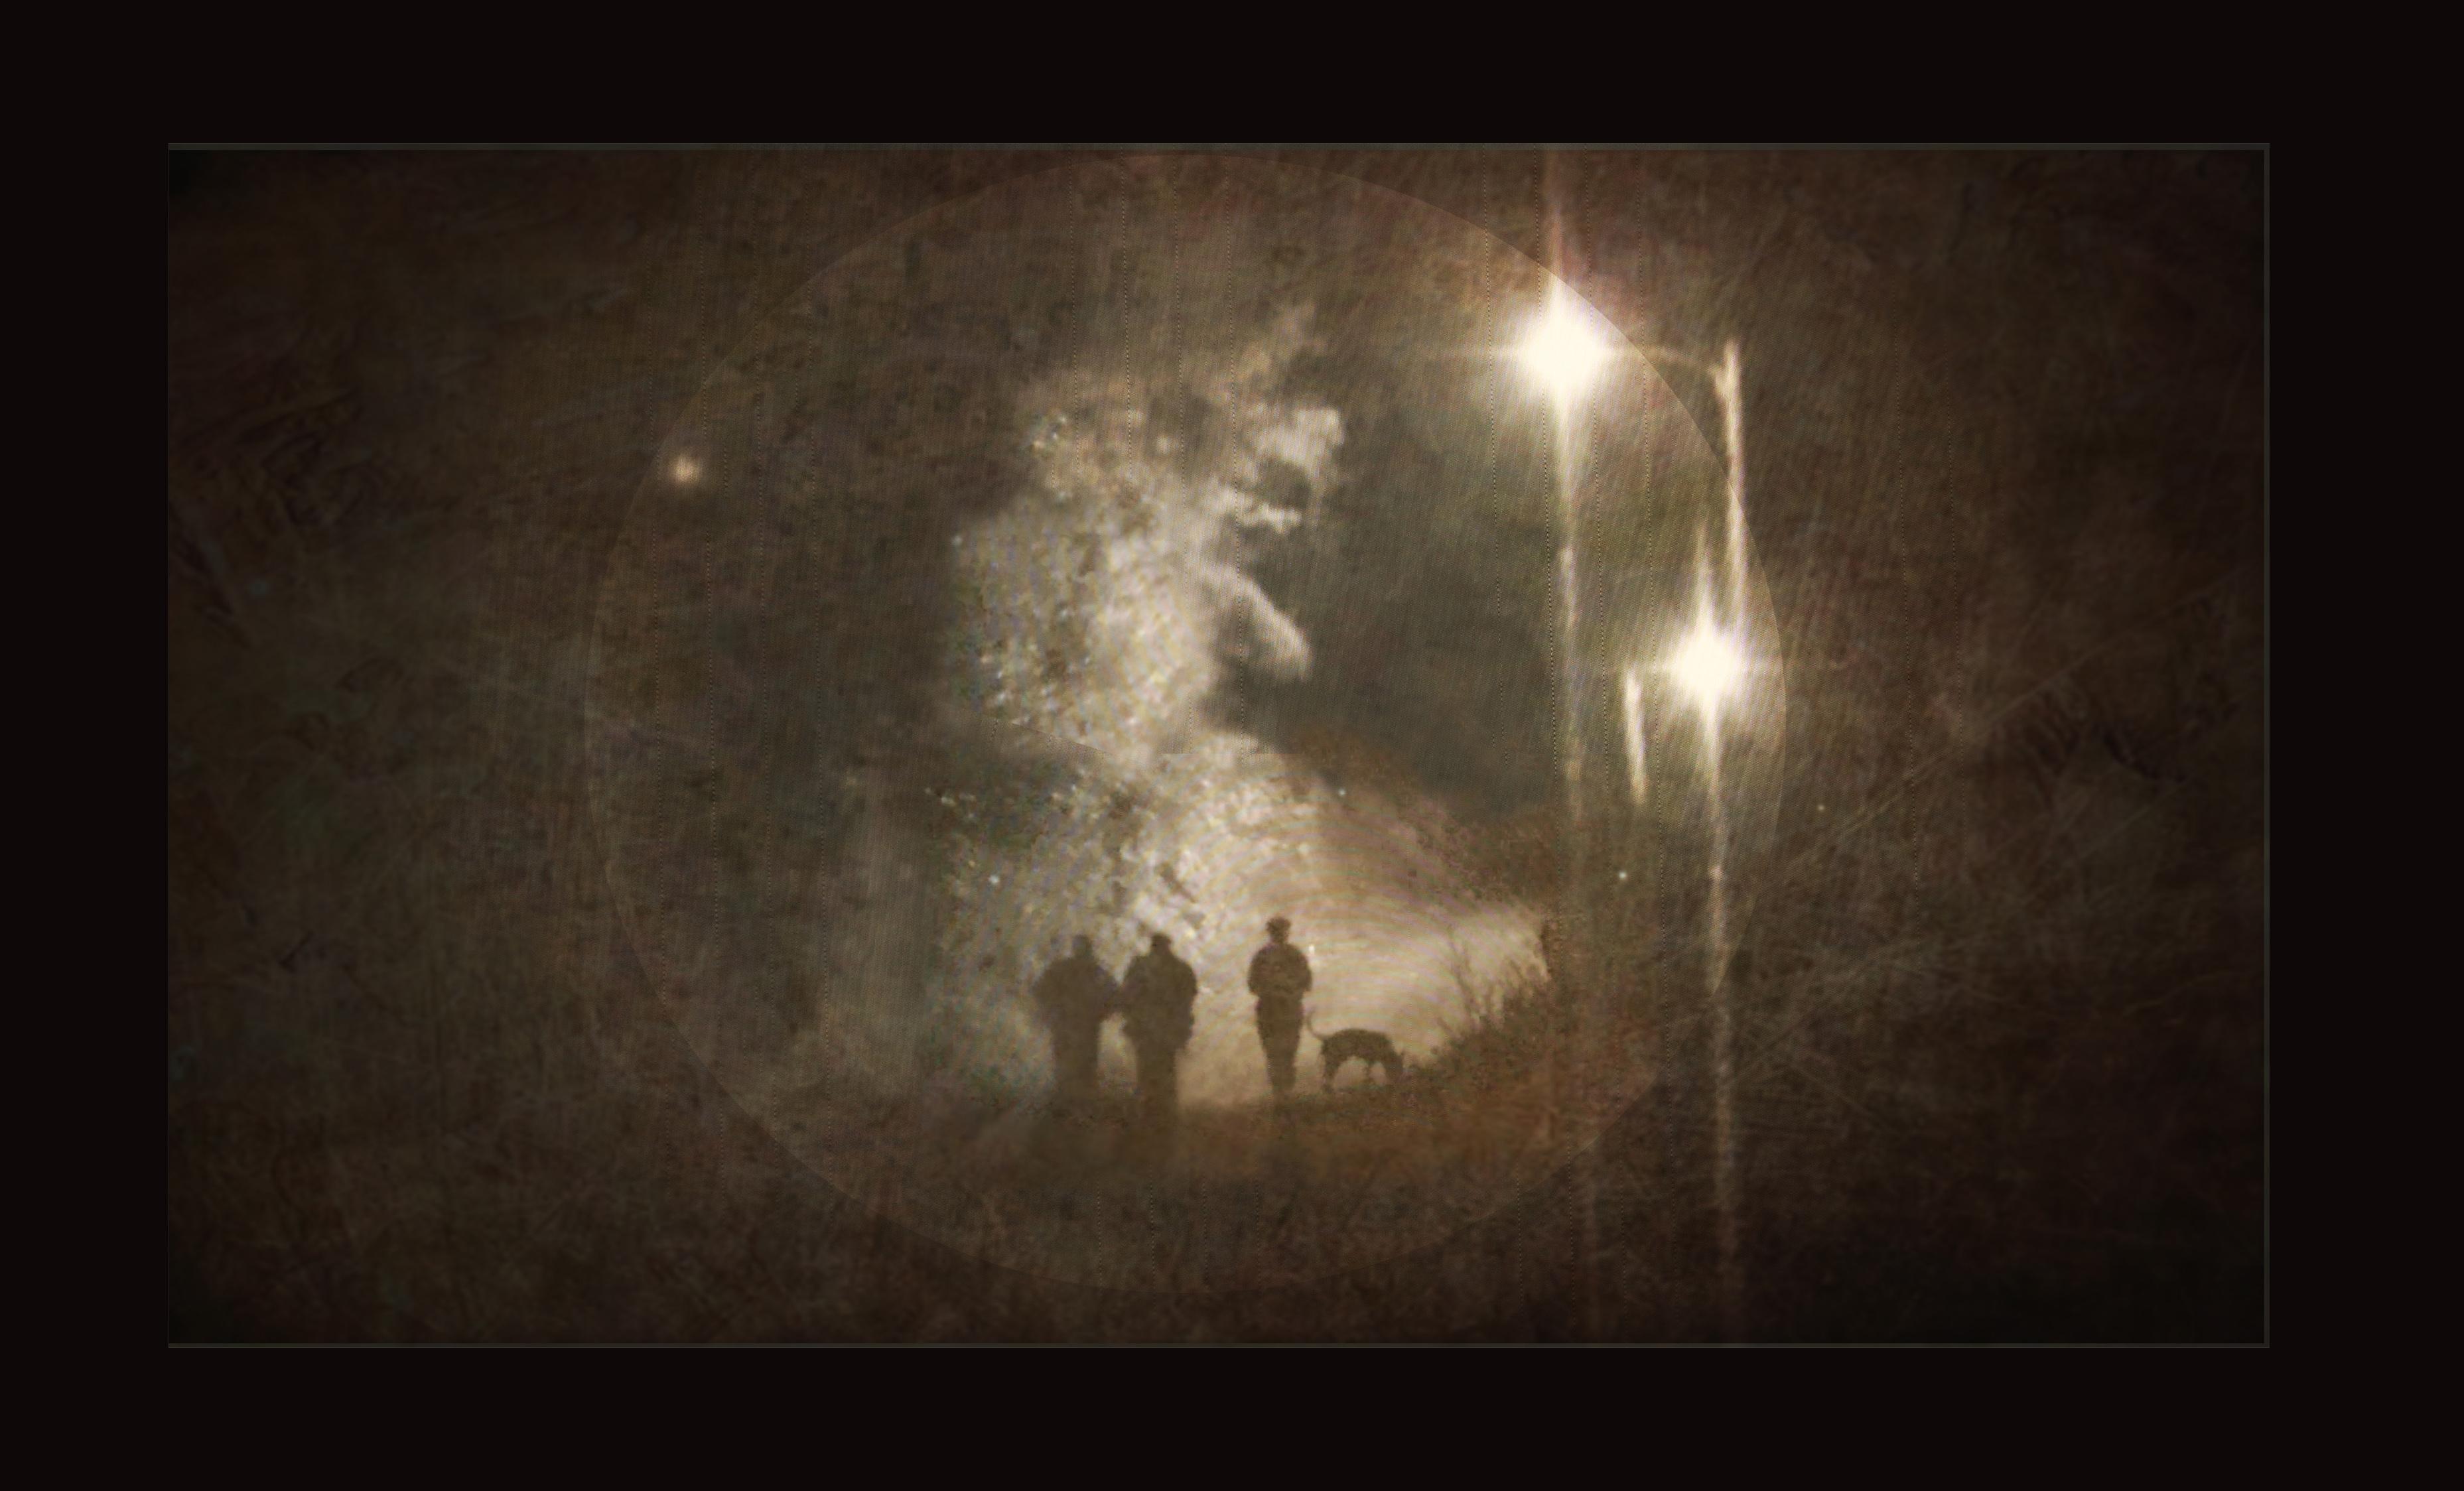 Night walk with Mavis + Winston